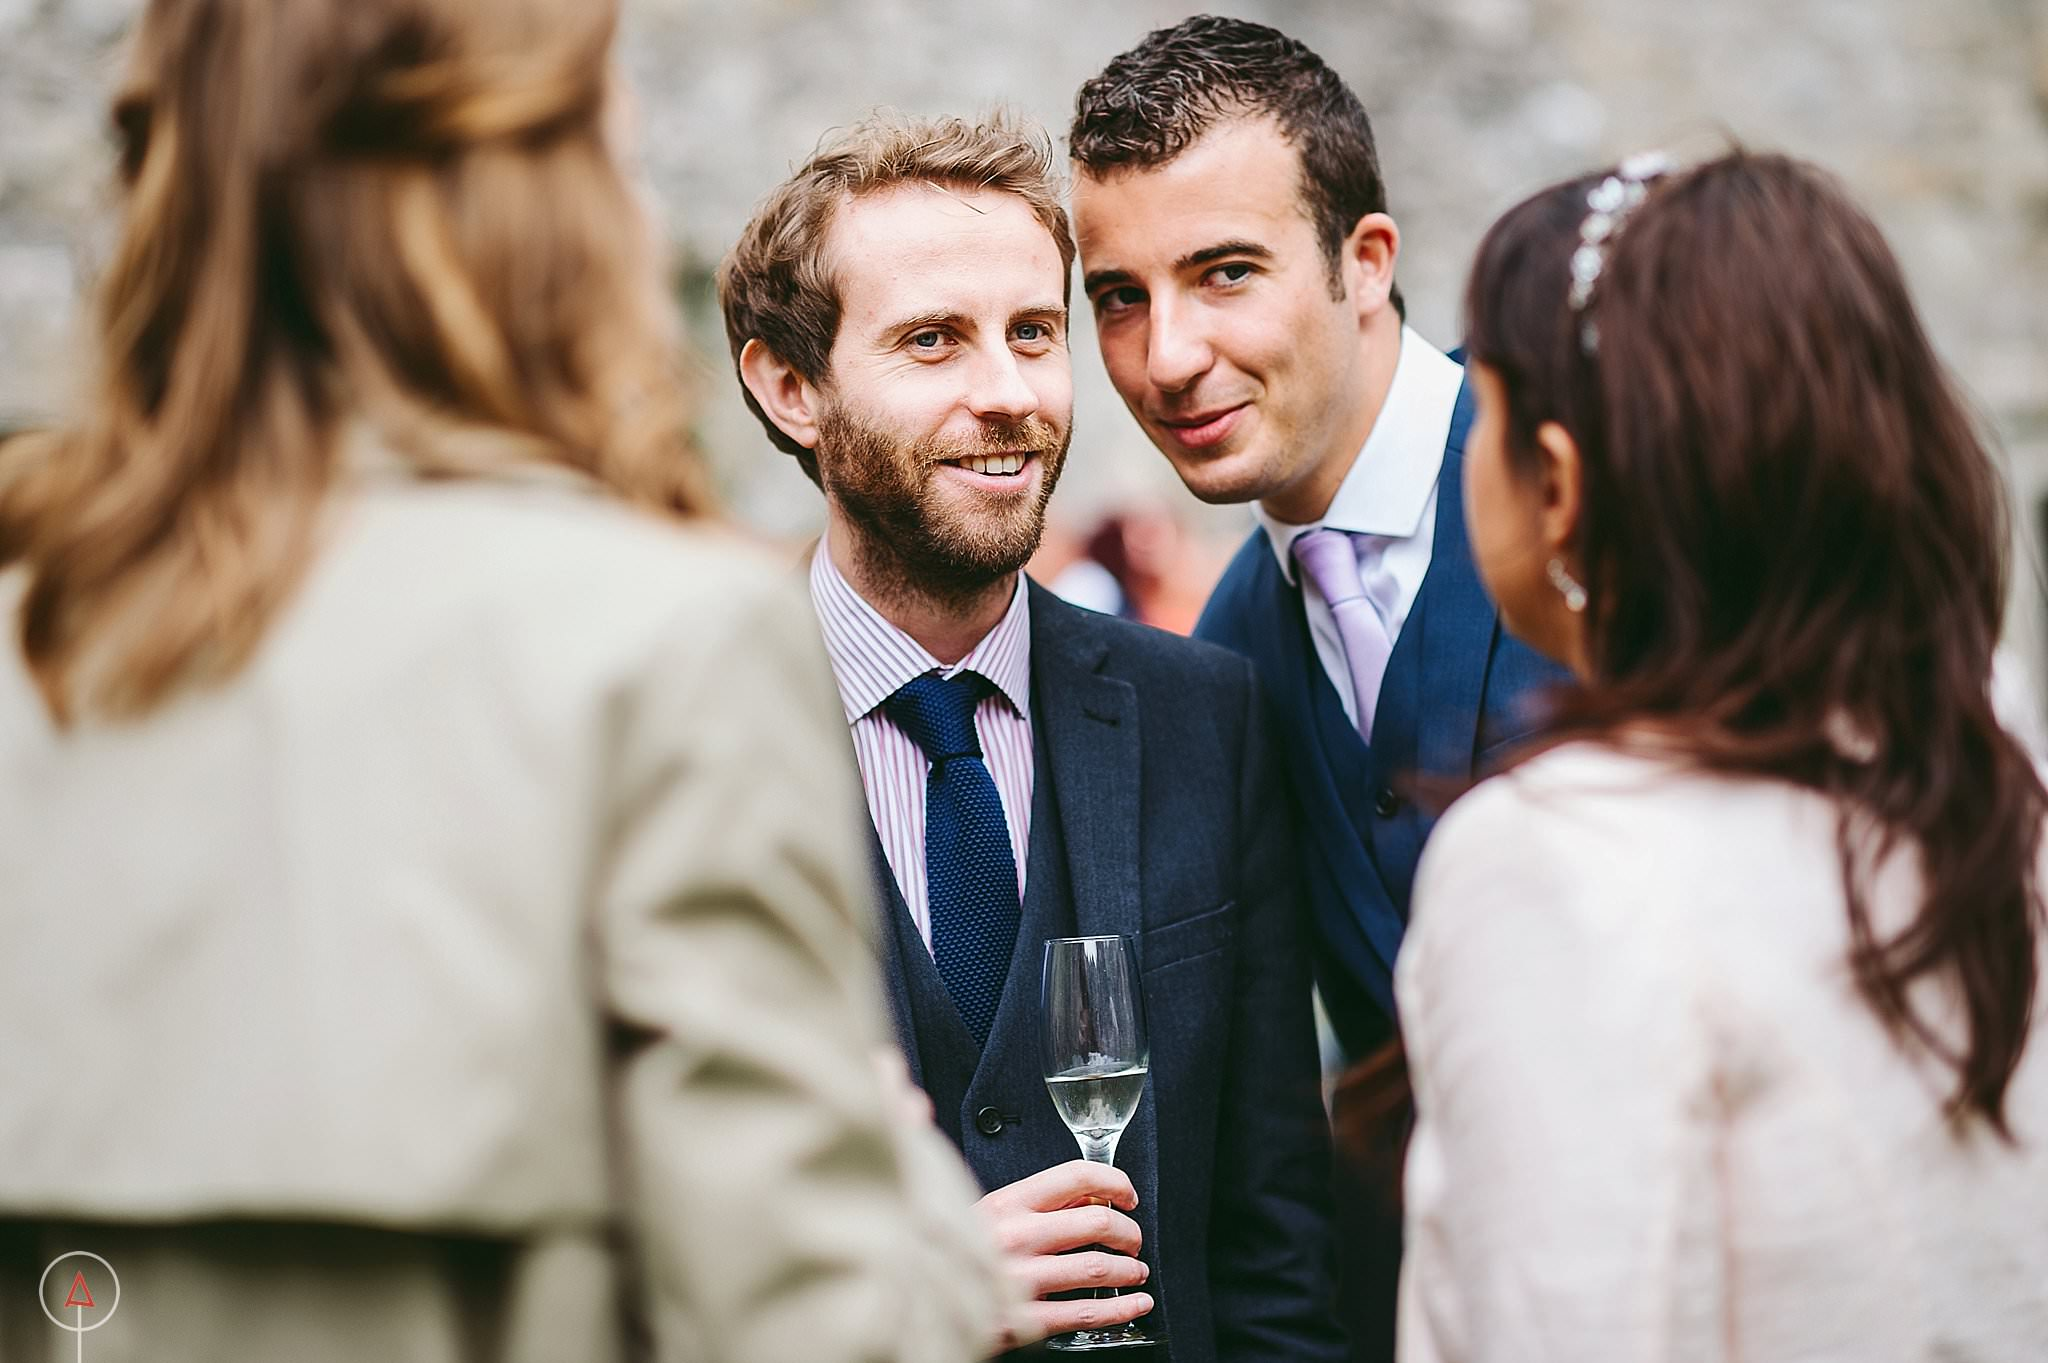 st-donats-llantwit-major-wedding-photography_0057